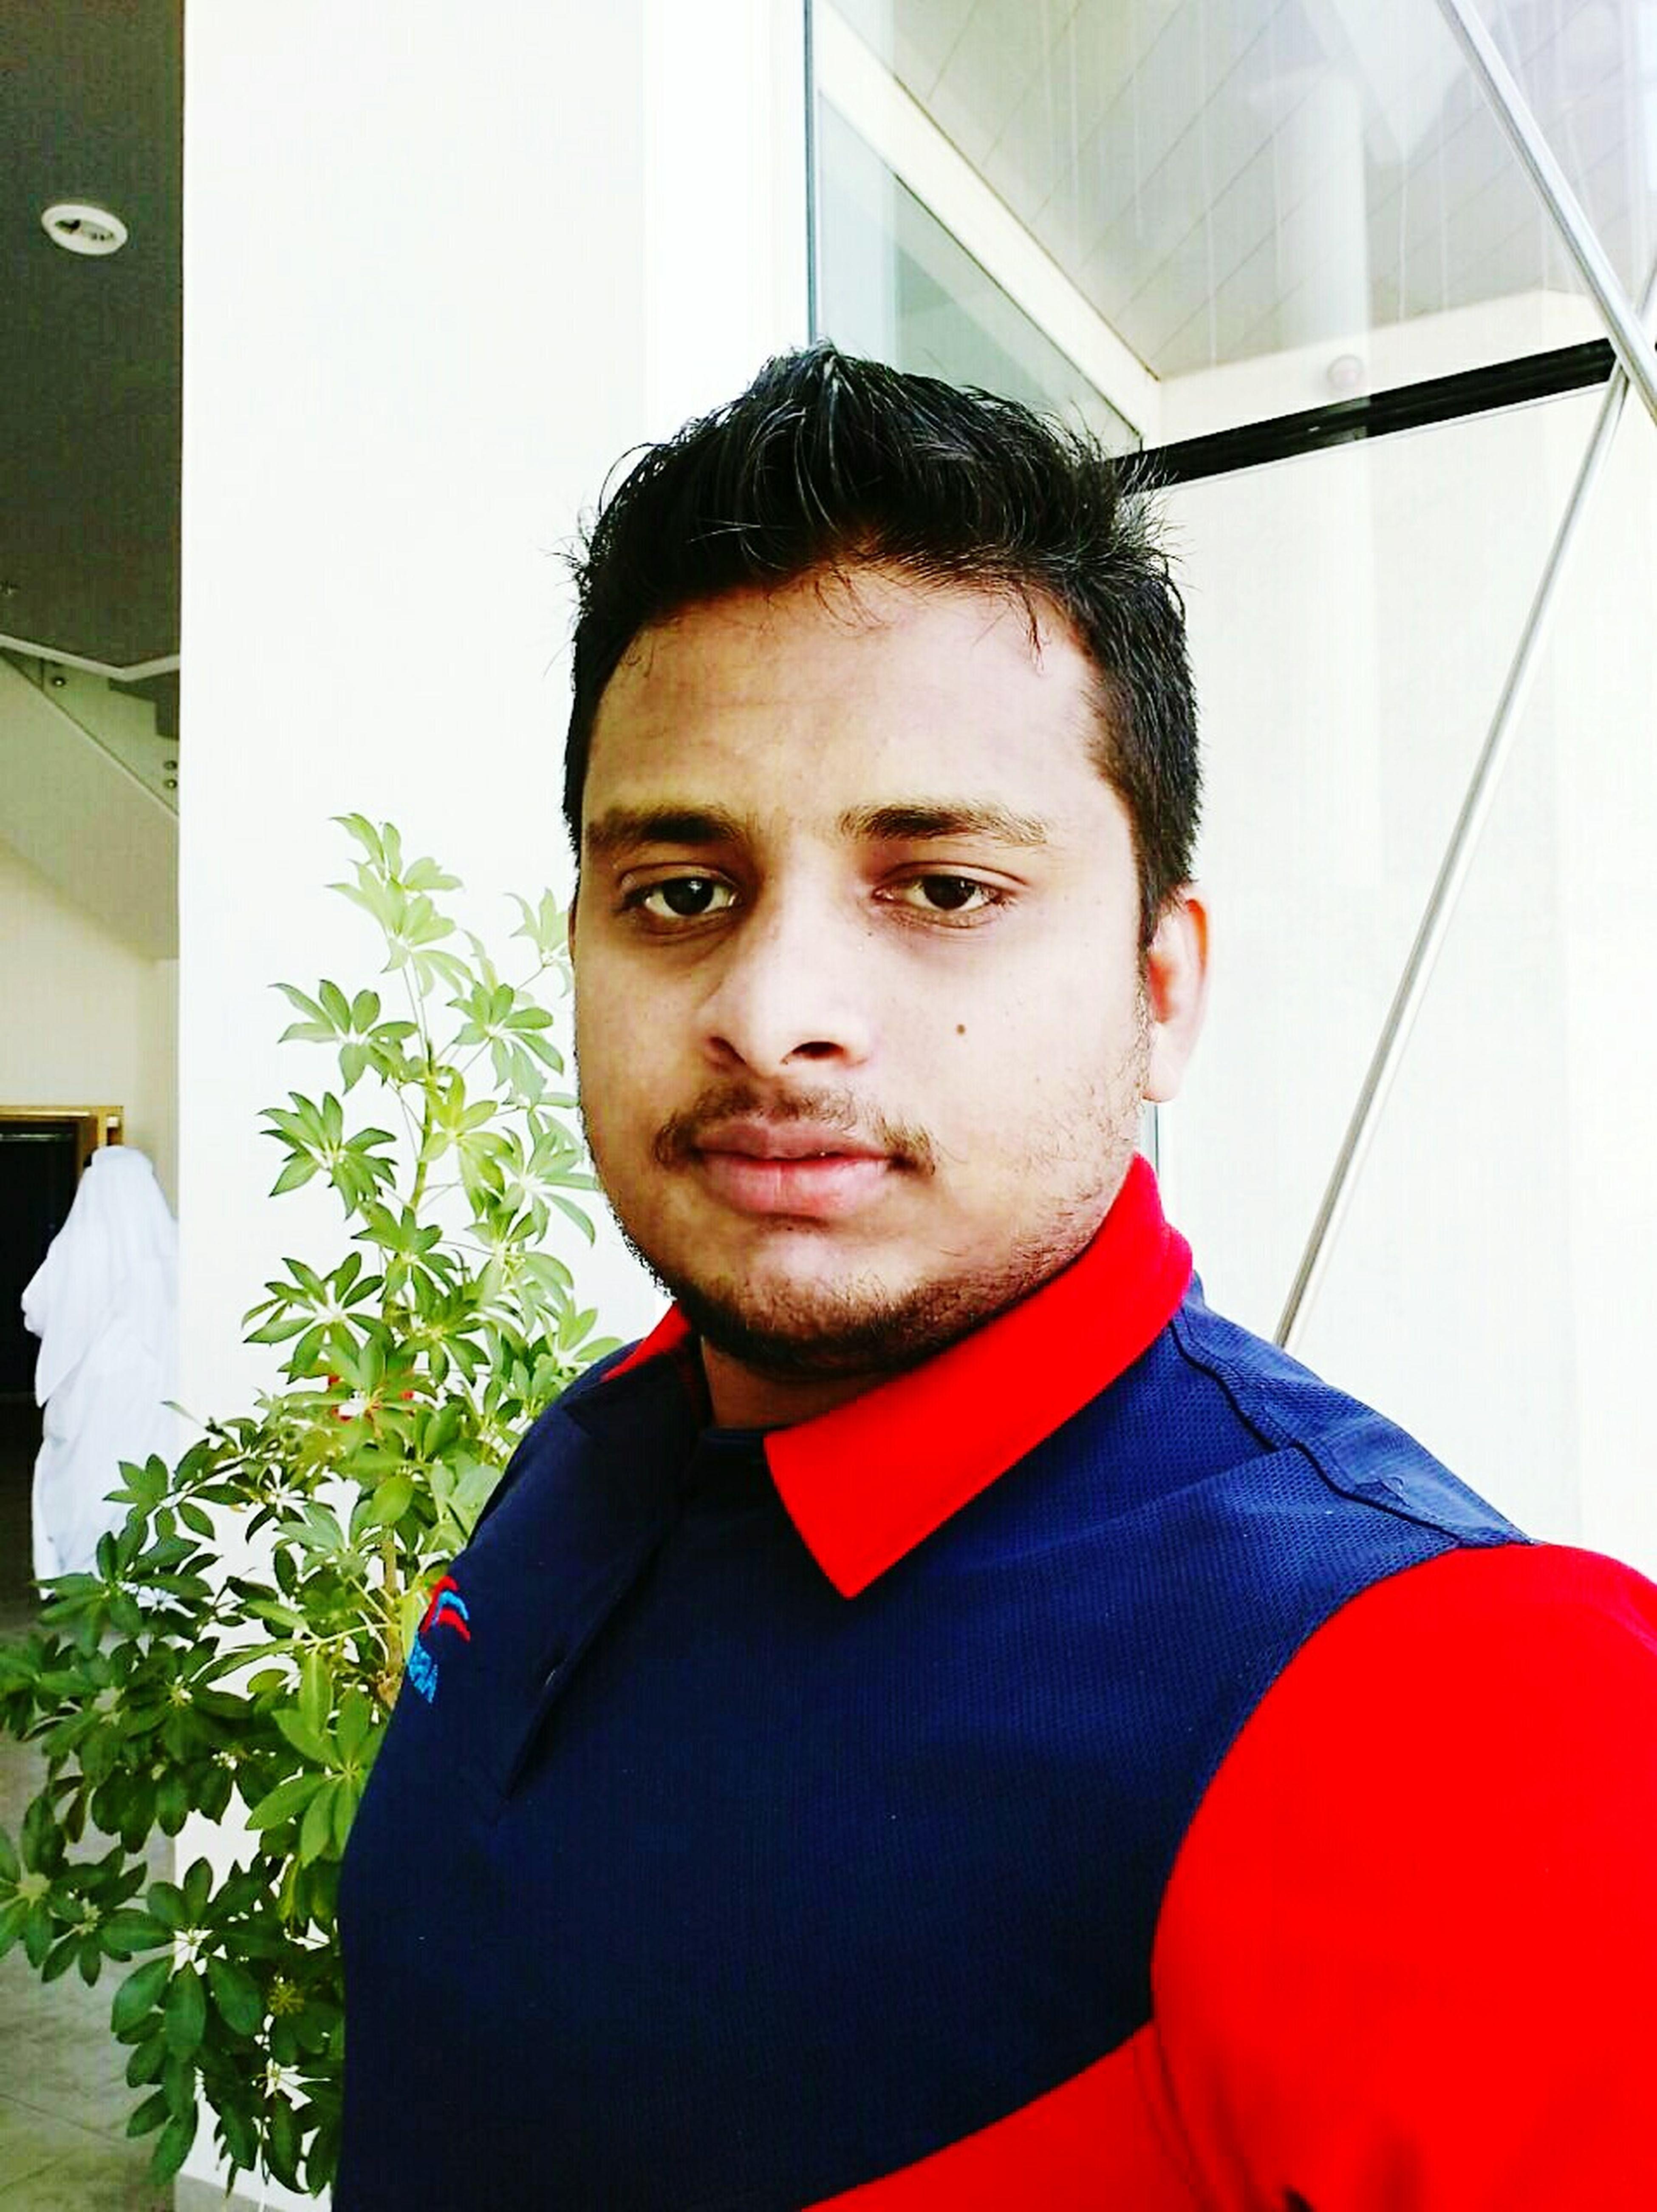 Feeling good... Working First Eyeem Photo